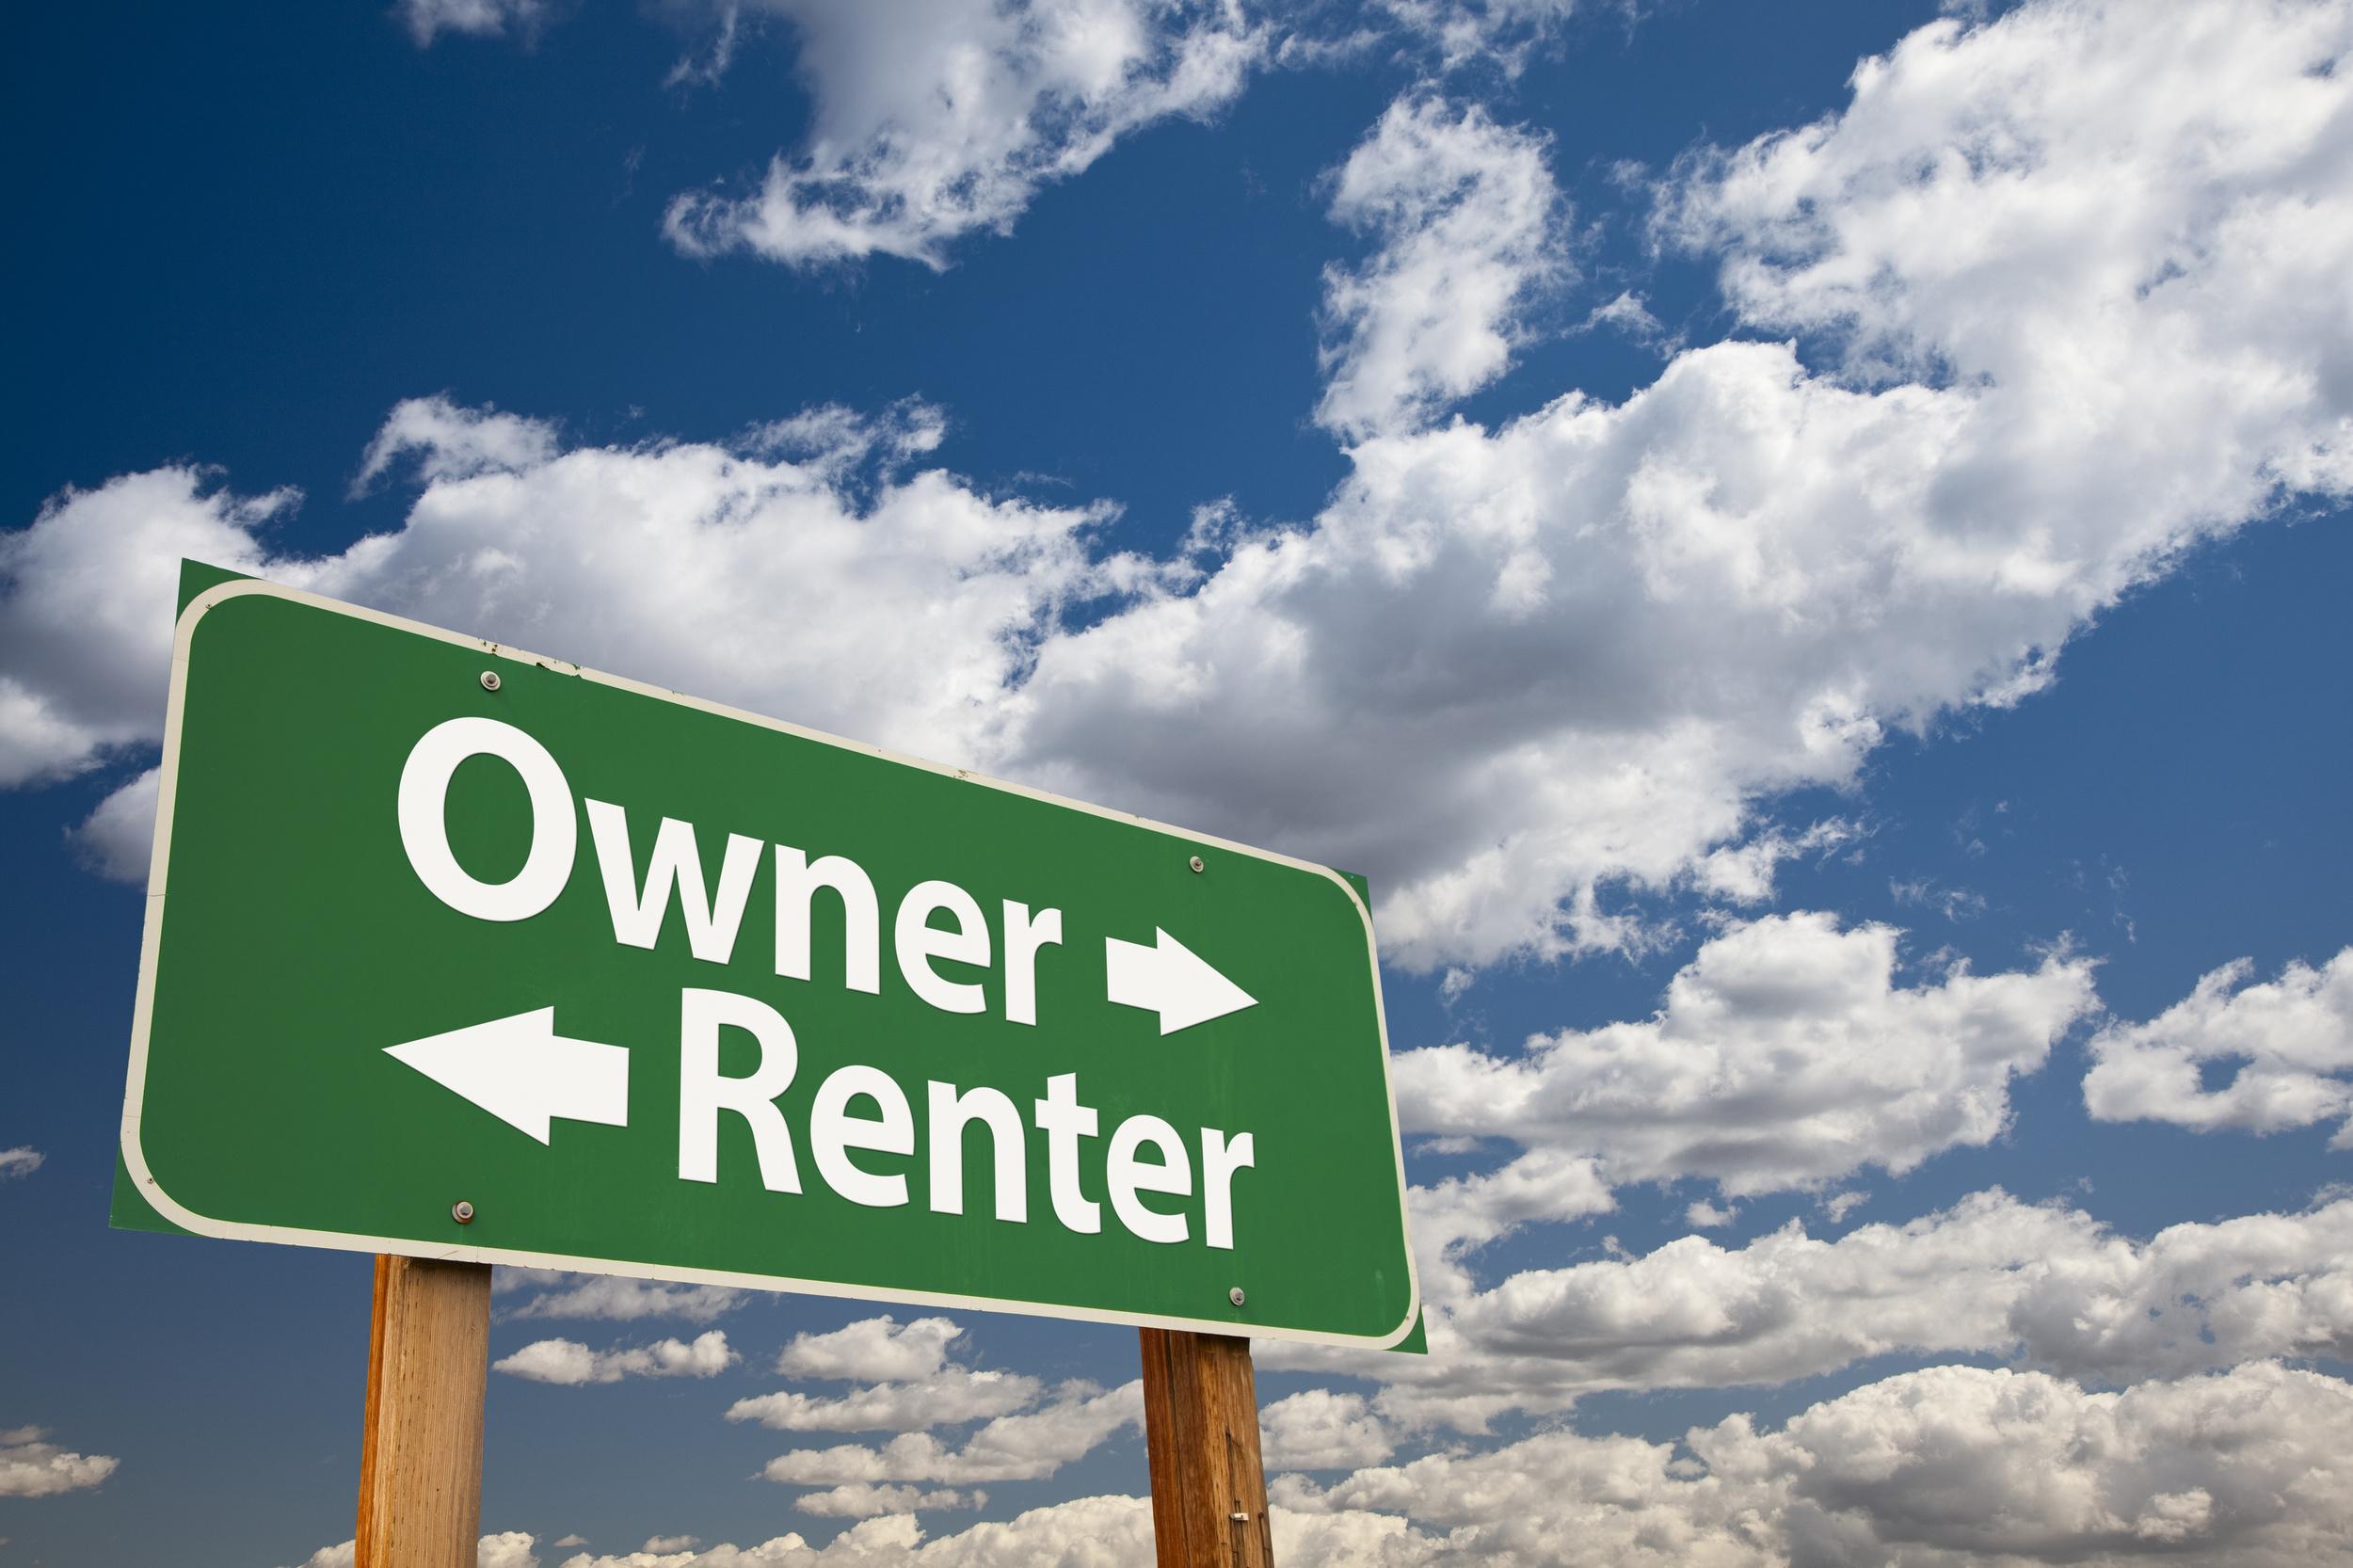 Renters versus Owners